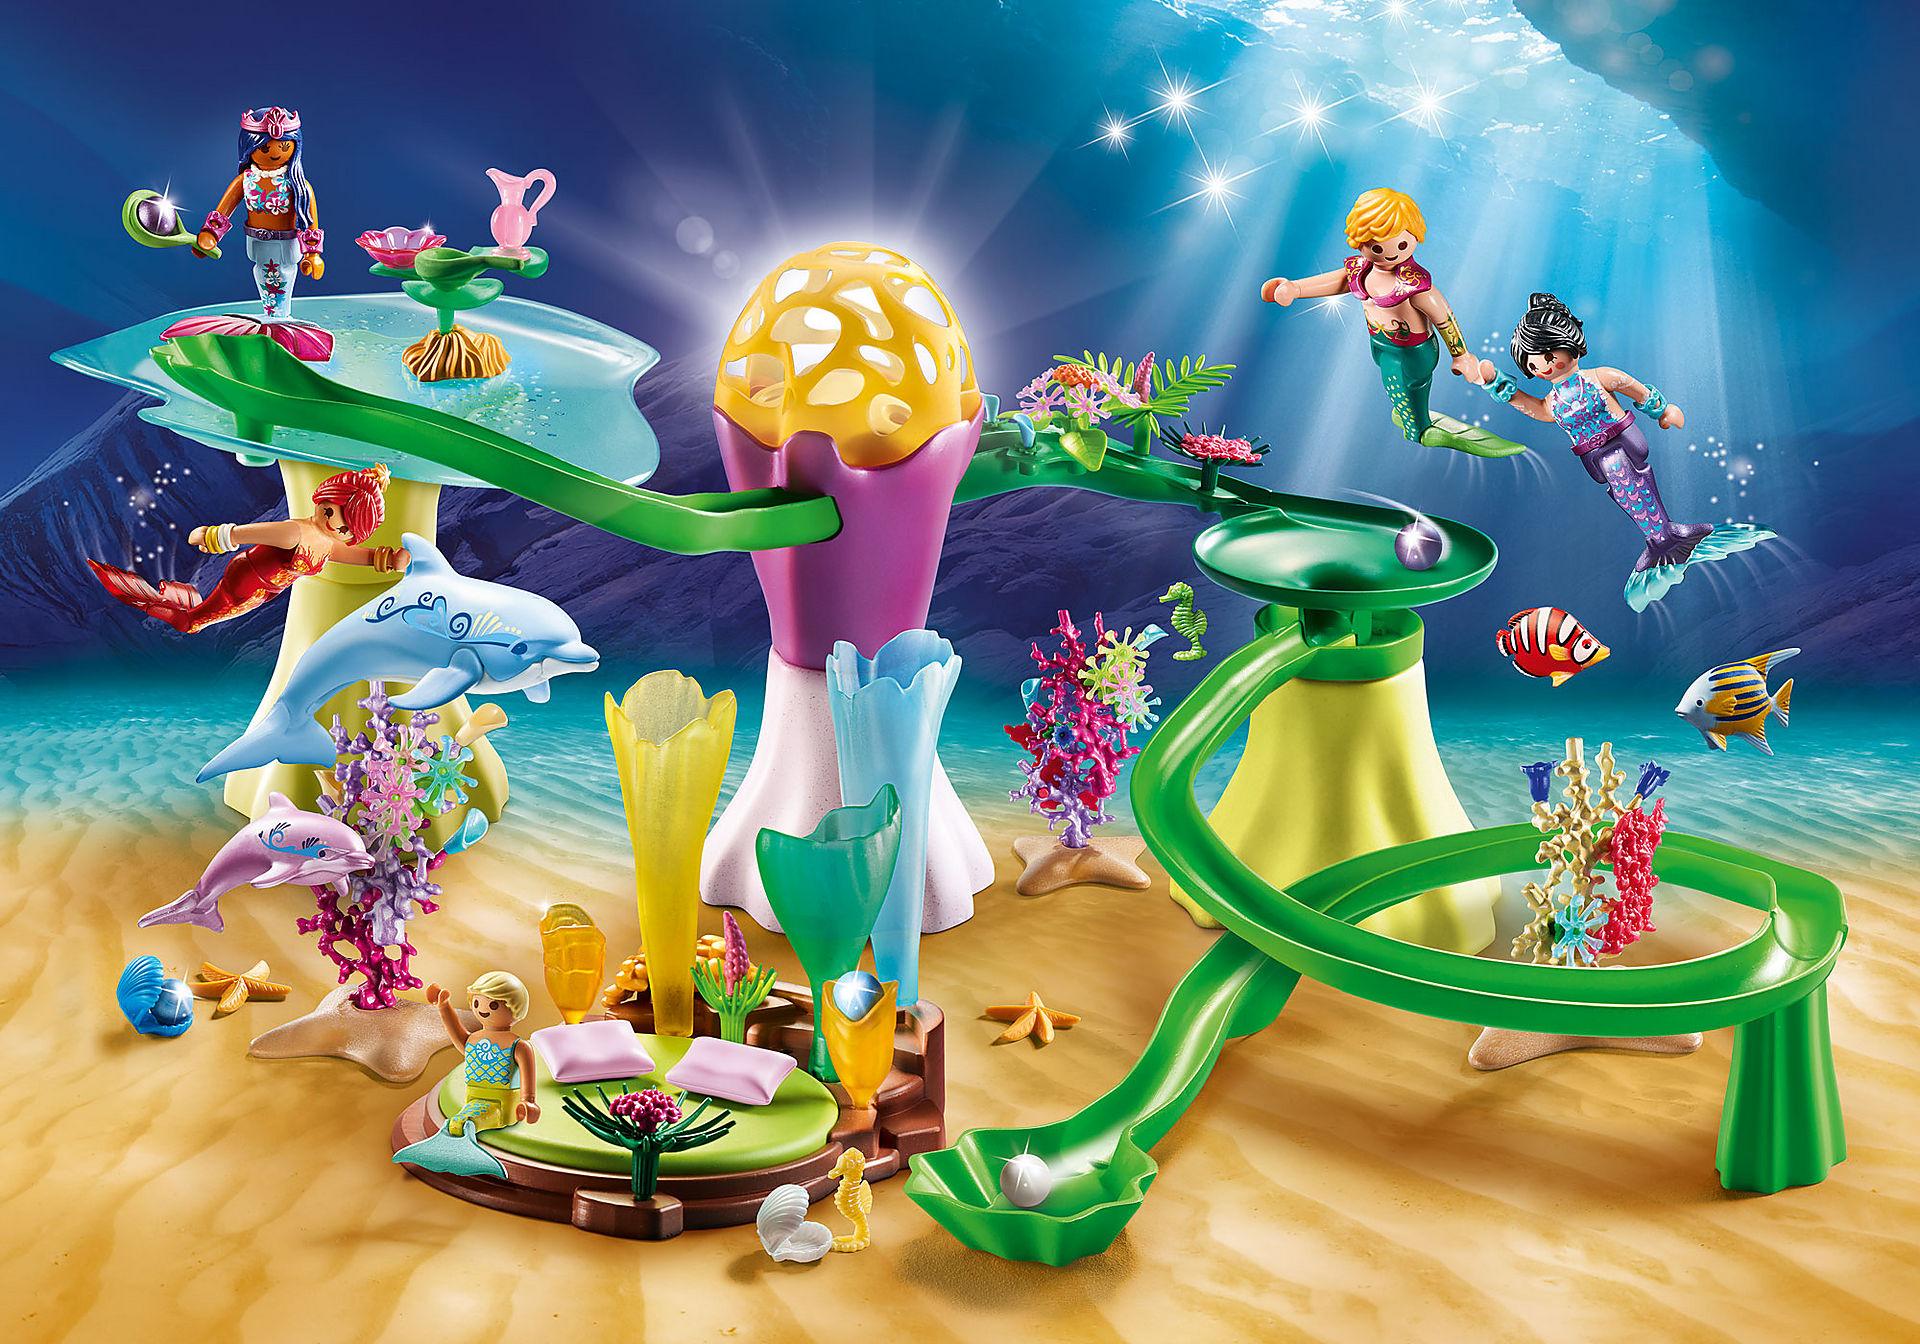 70094 Cala de Sirenas con Cúpula Iluminada zoom image1